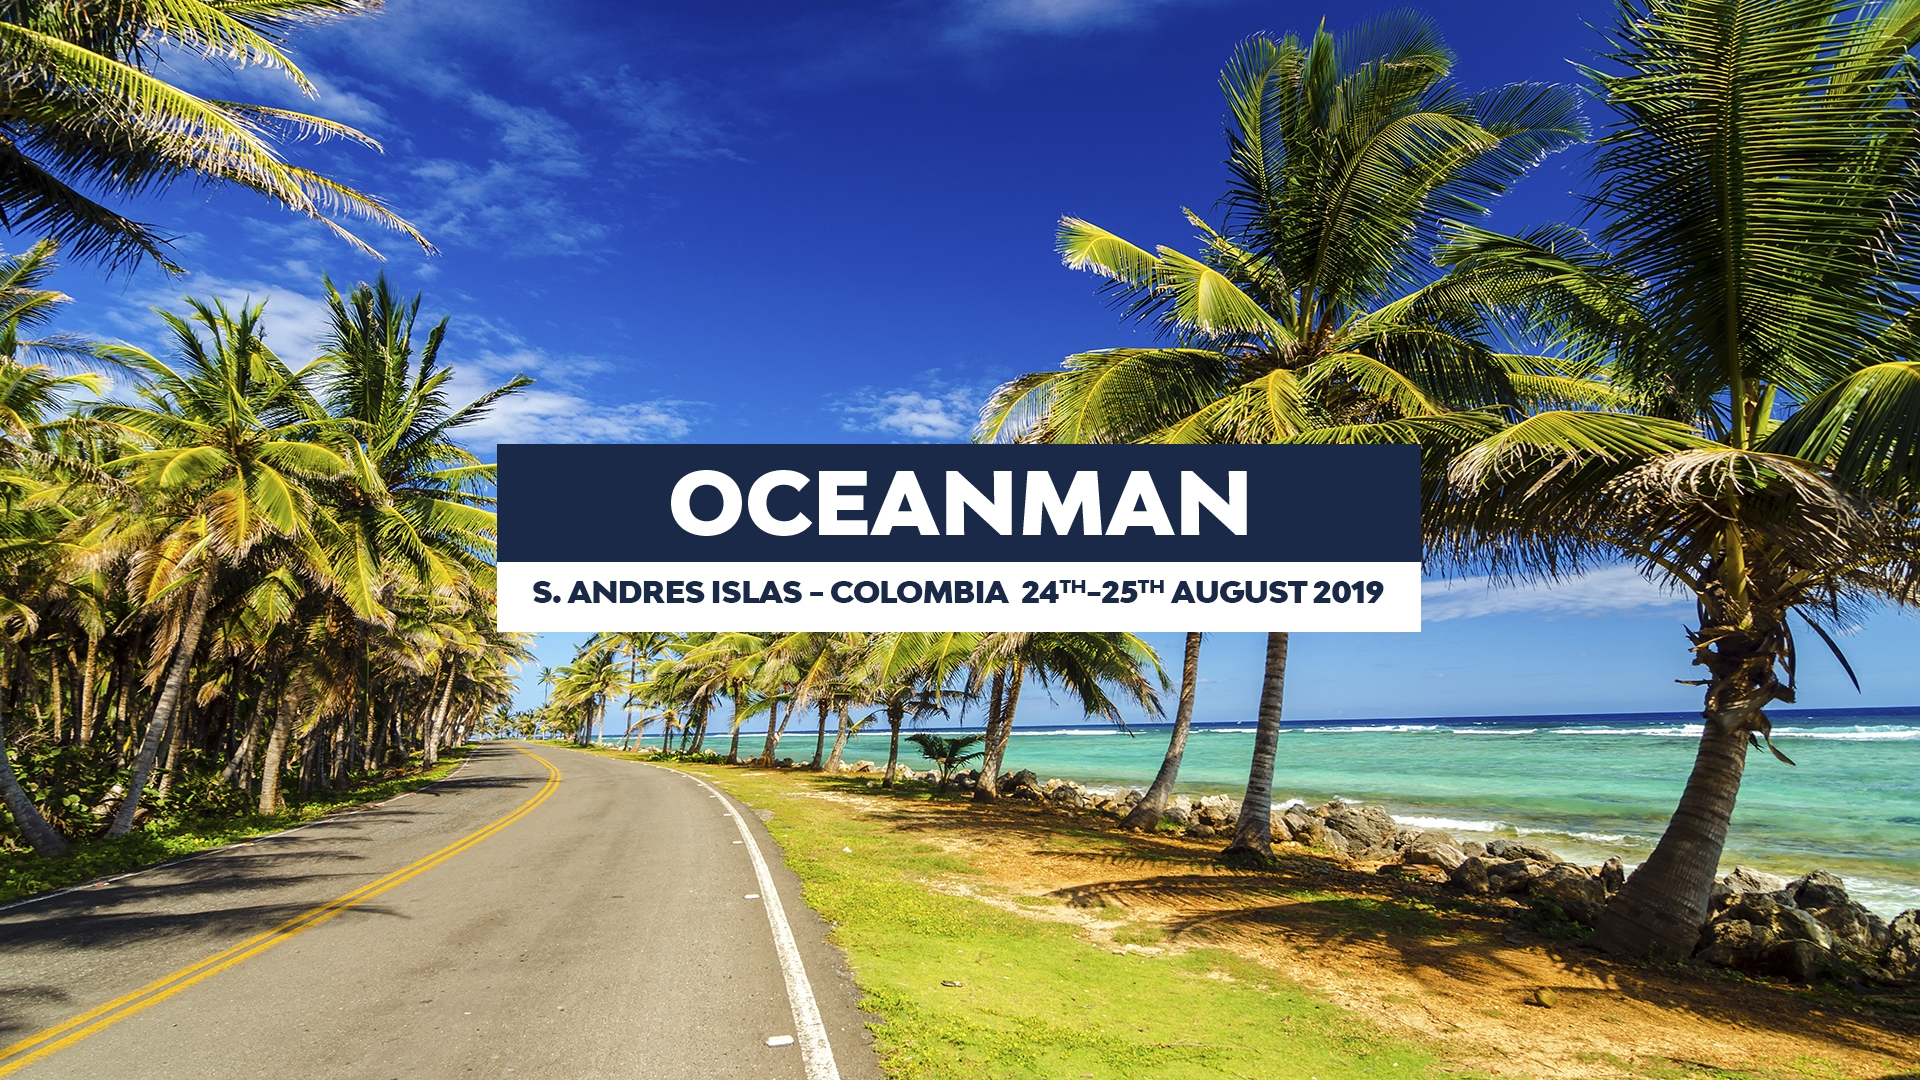 OCEANMAN SAN ANDRES COLOMBIA 19